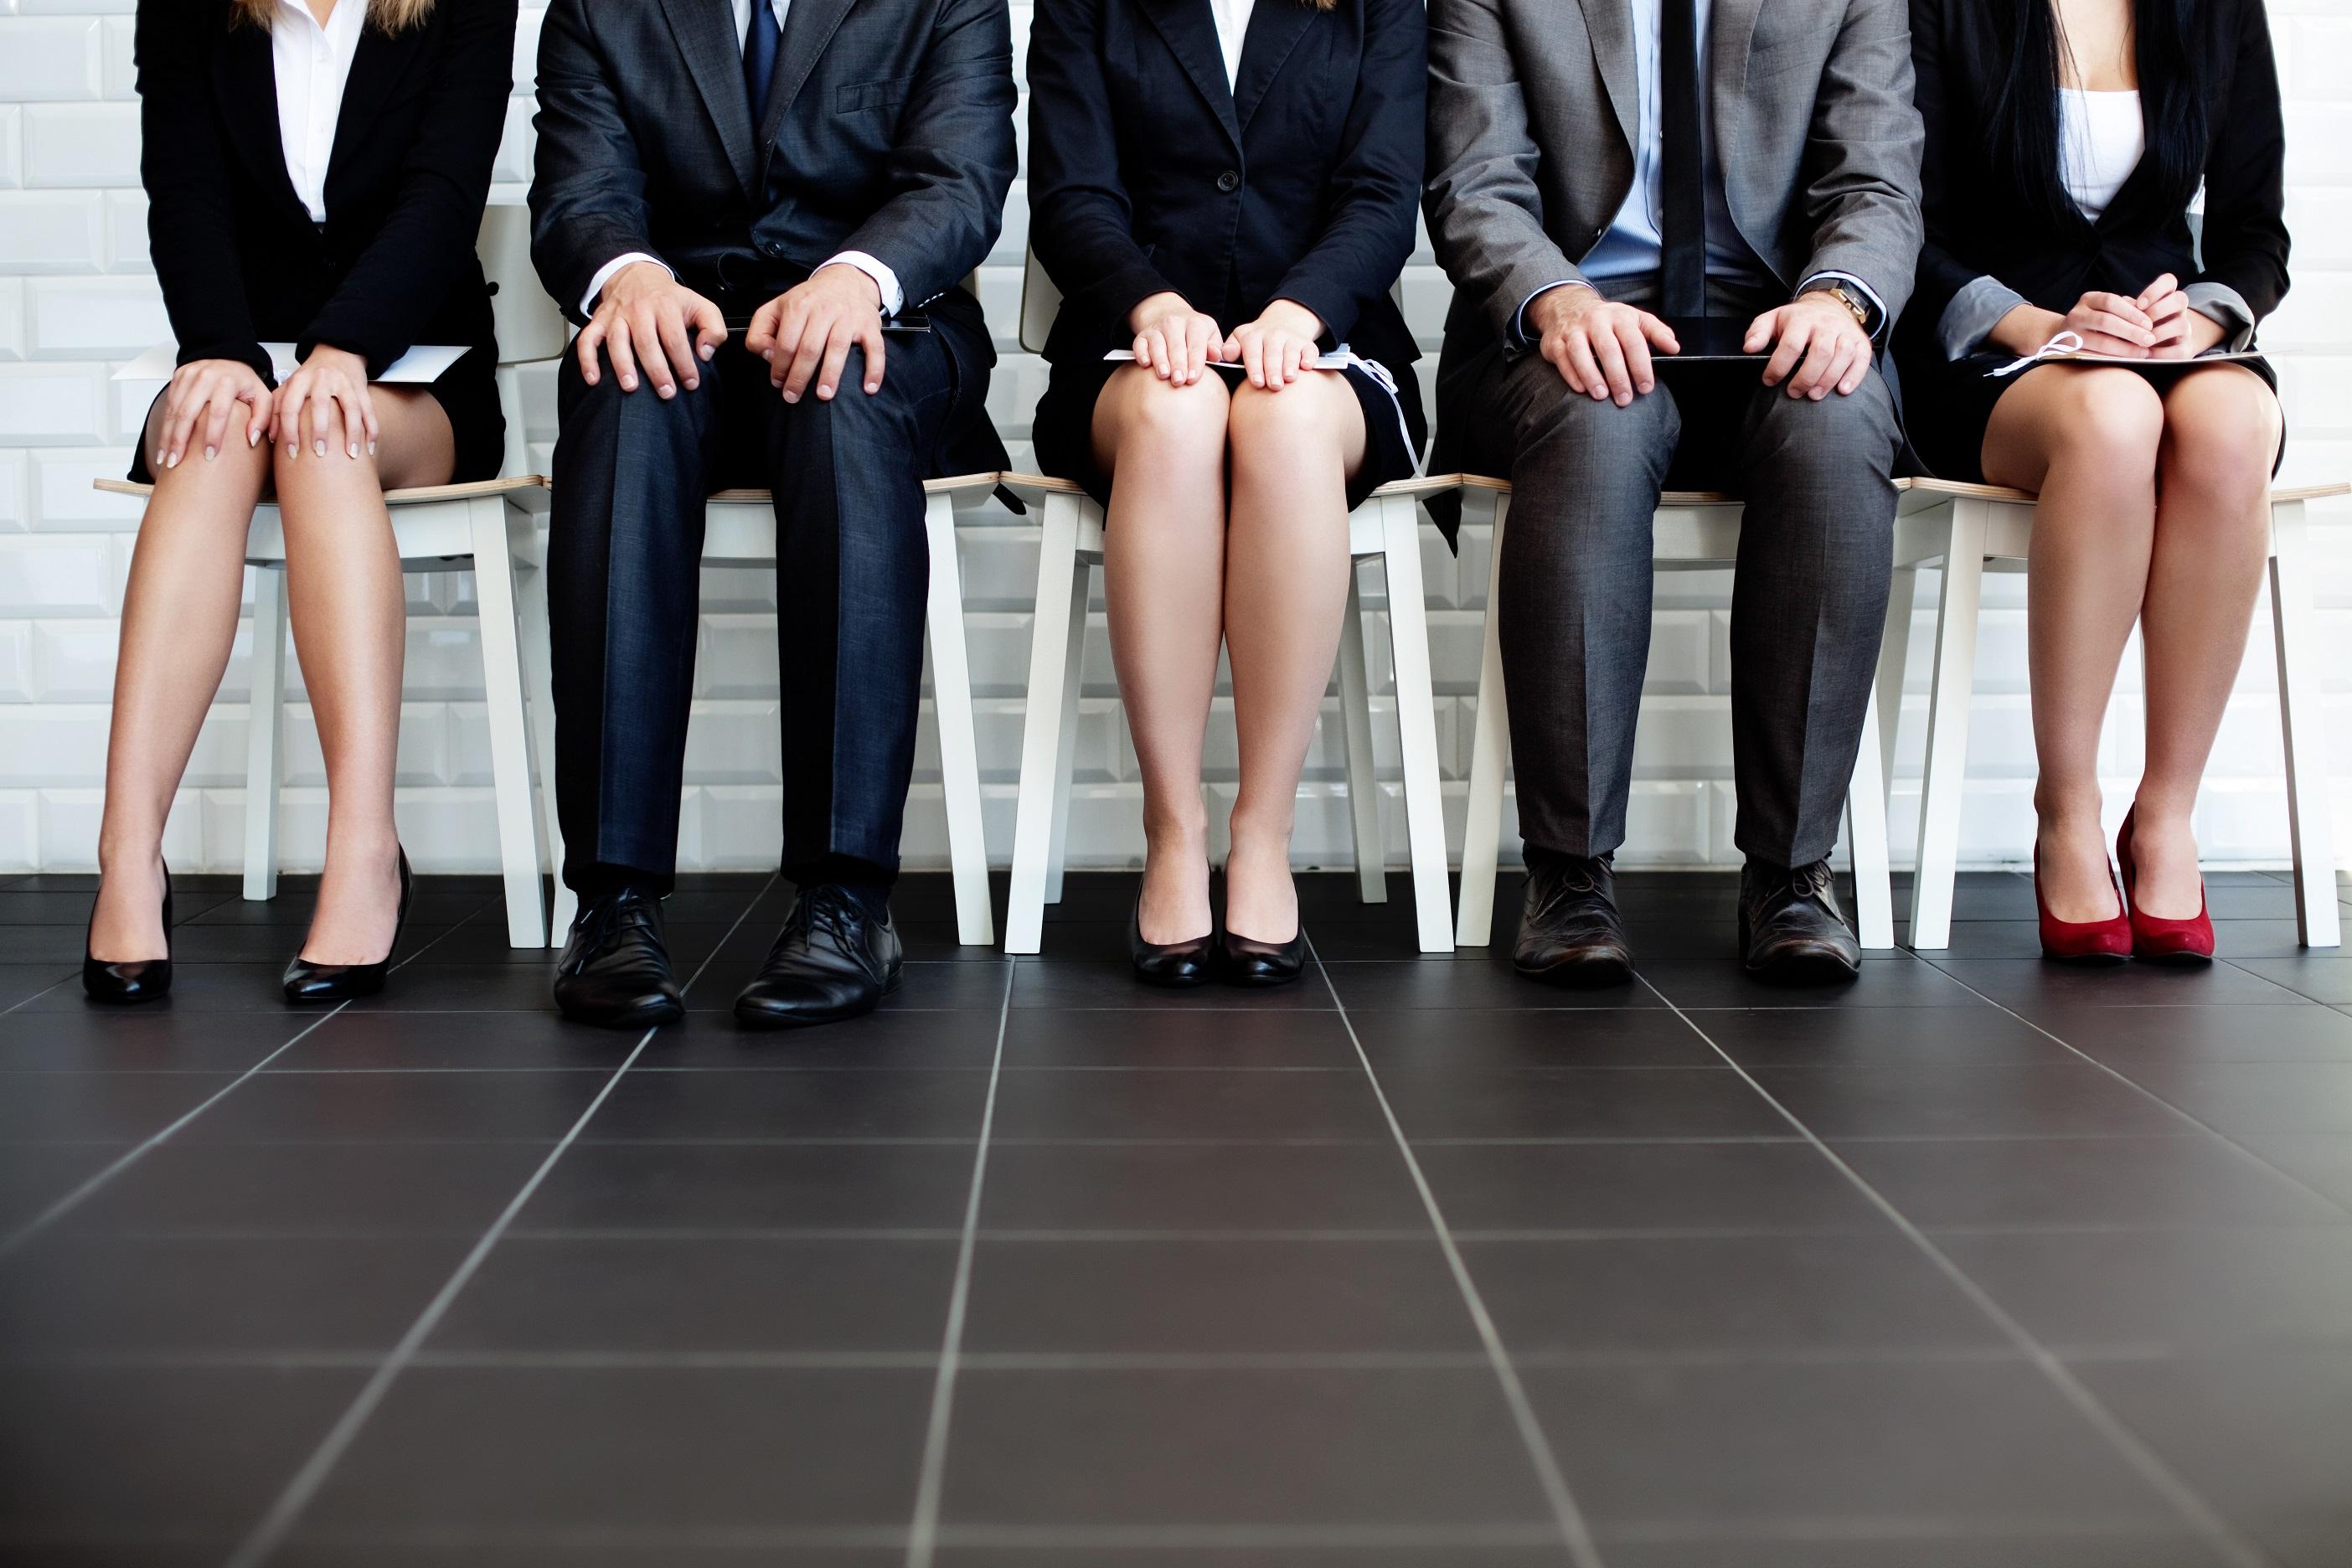 recruitment-people-line-waiting_1.jpg